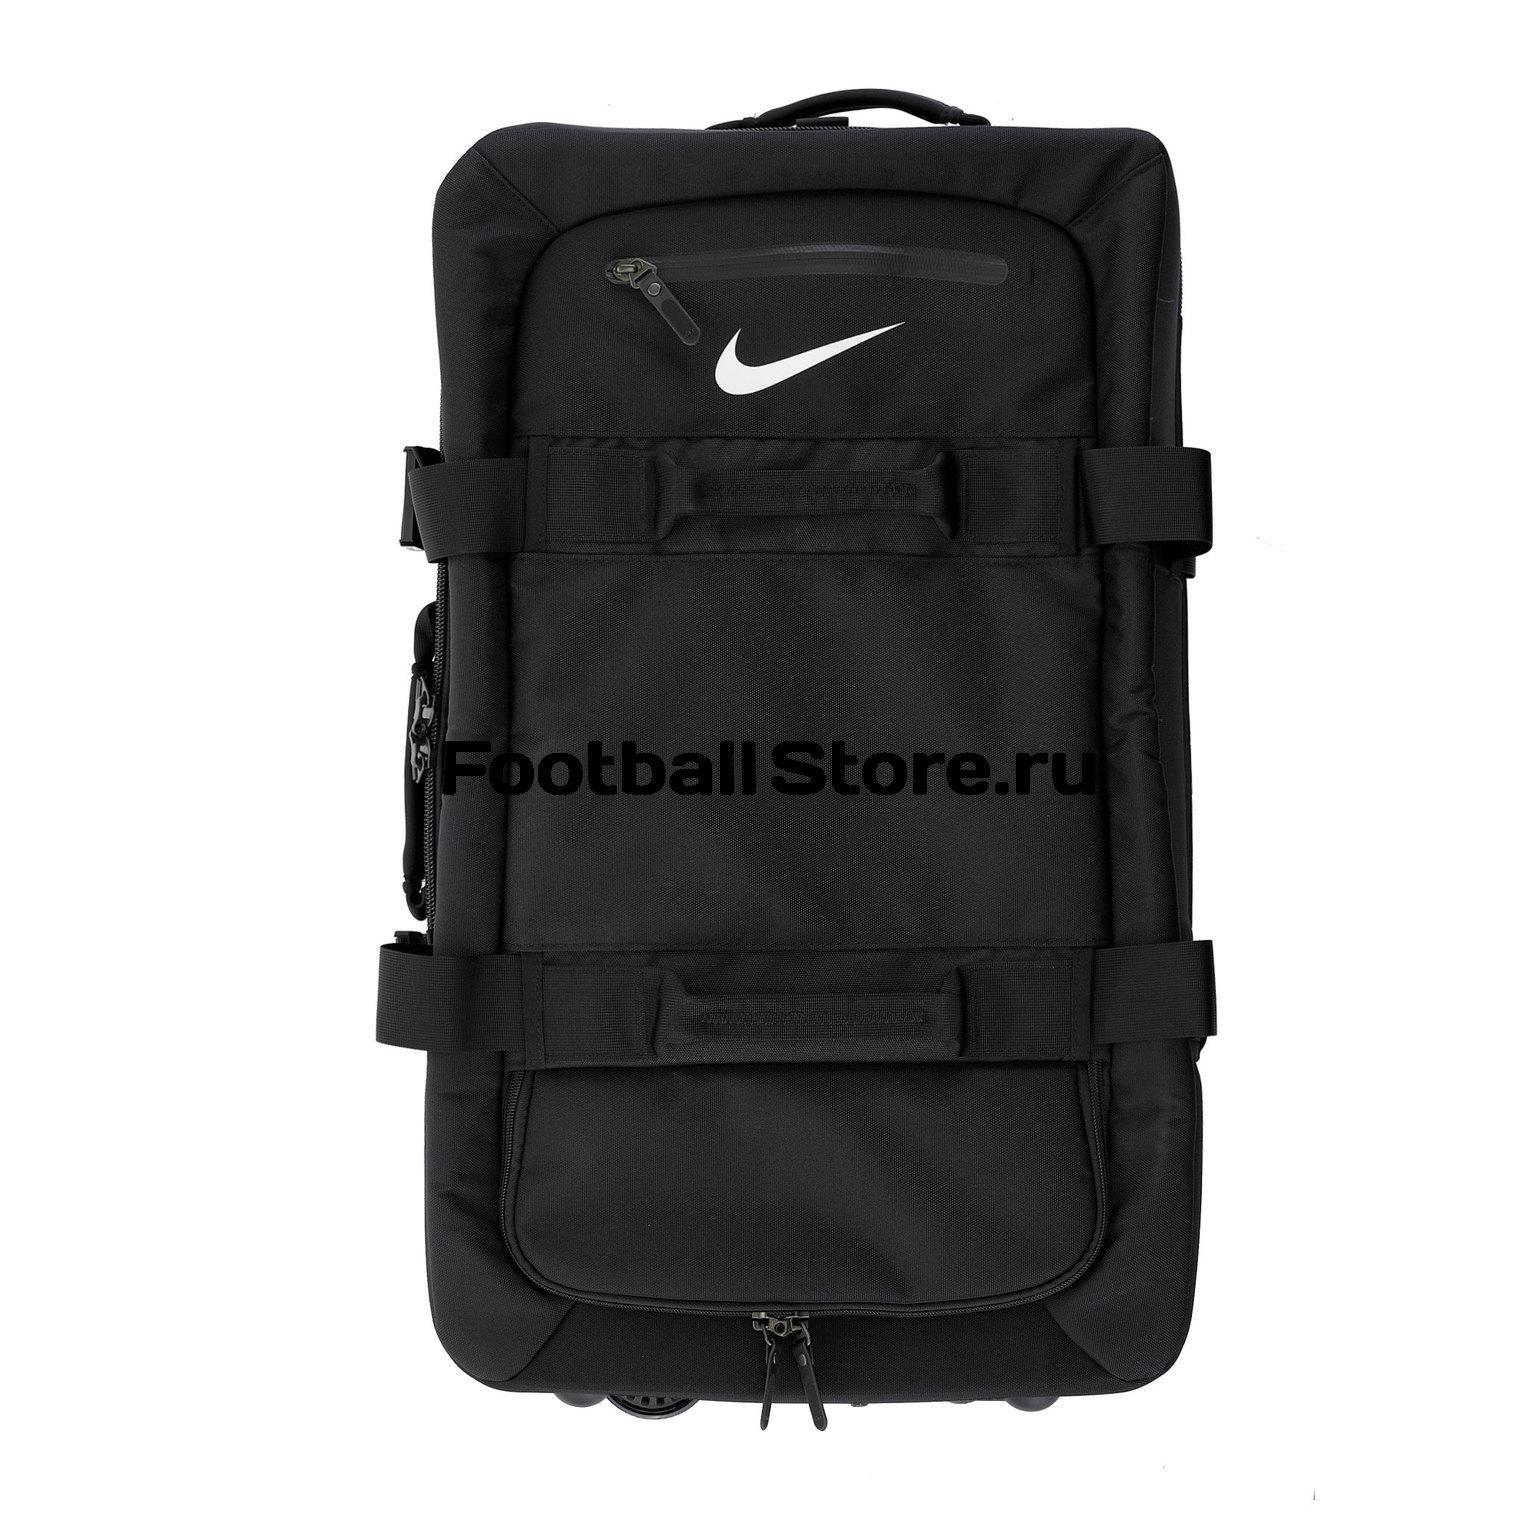 Сумка-чемодан Nike Medium Roller PBZ279-001